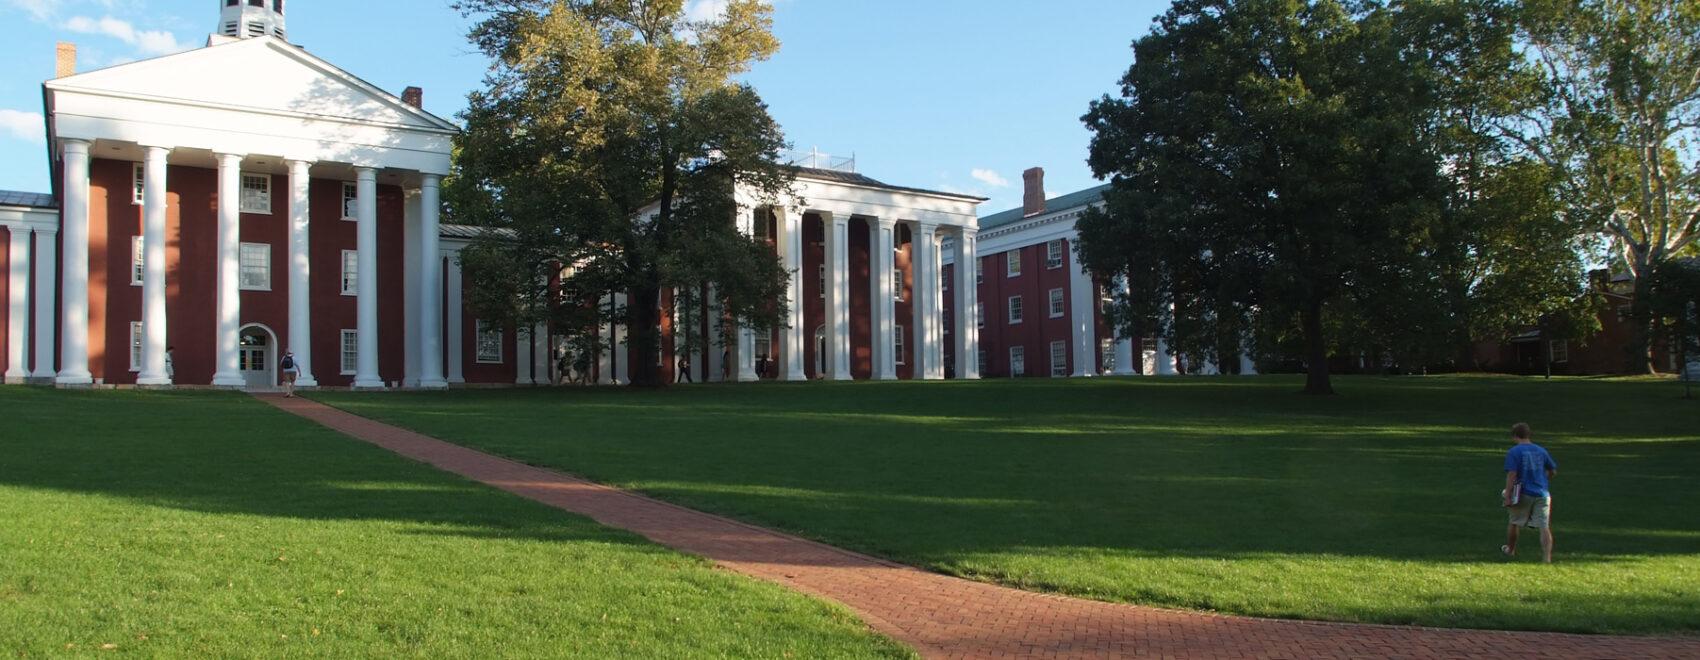 The campus at Washington & Lee University